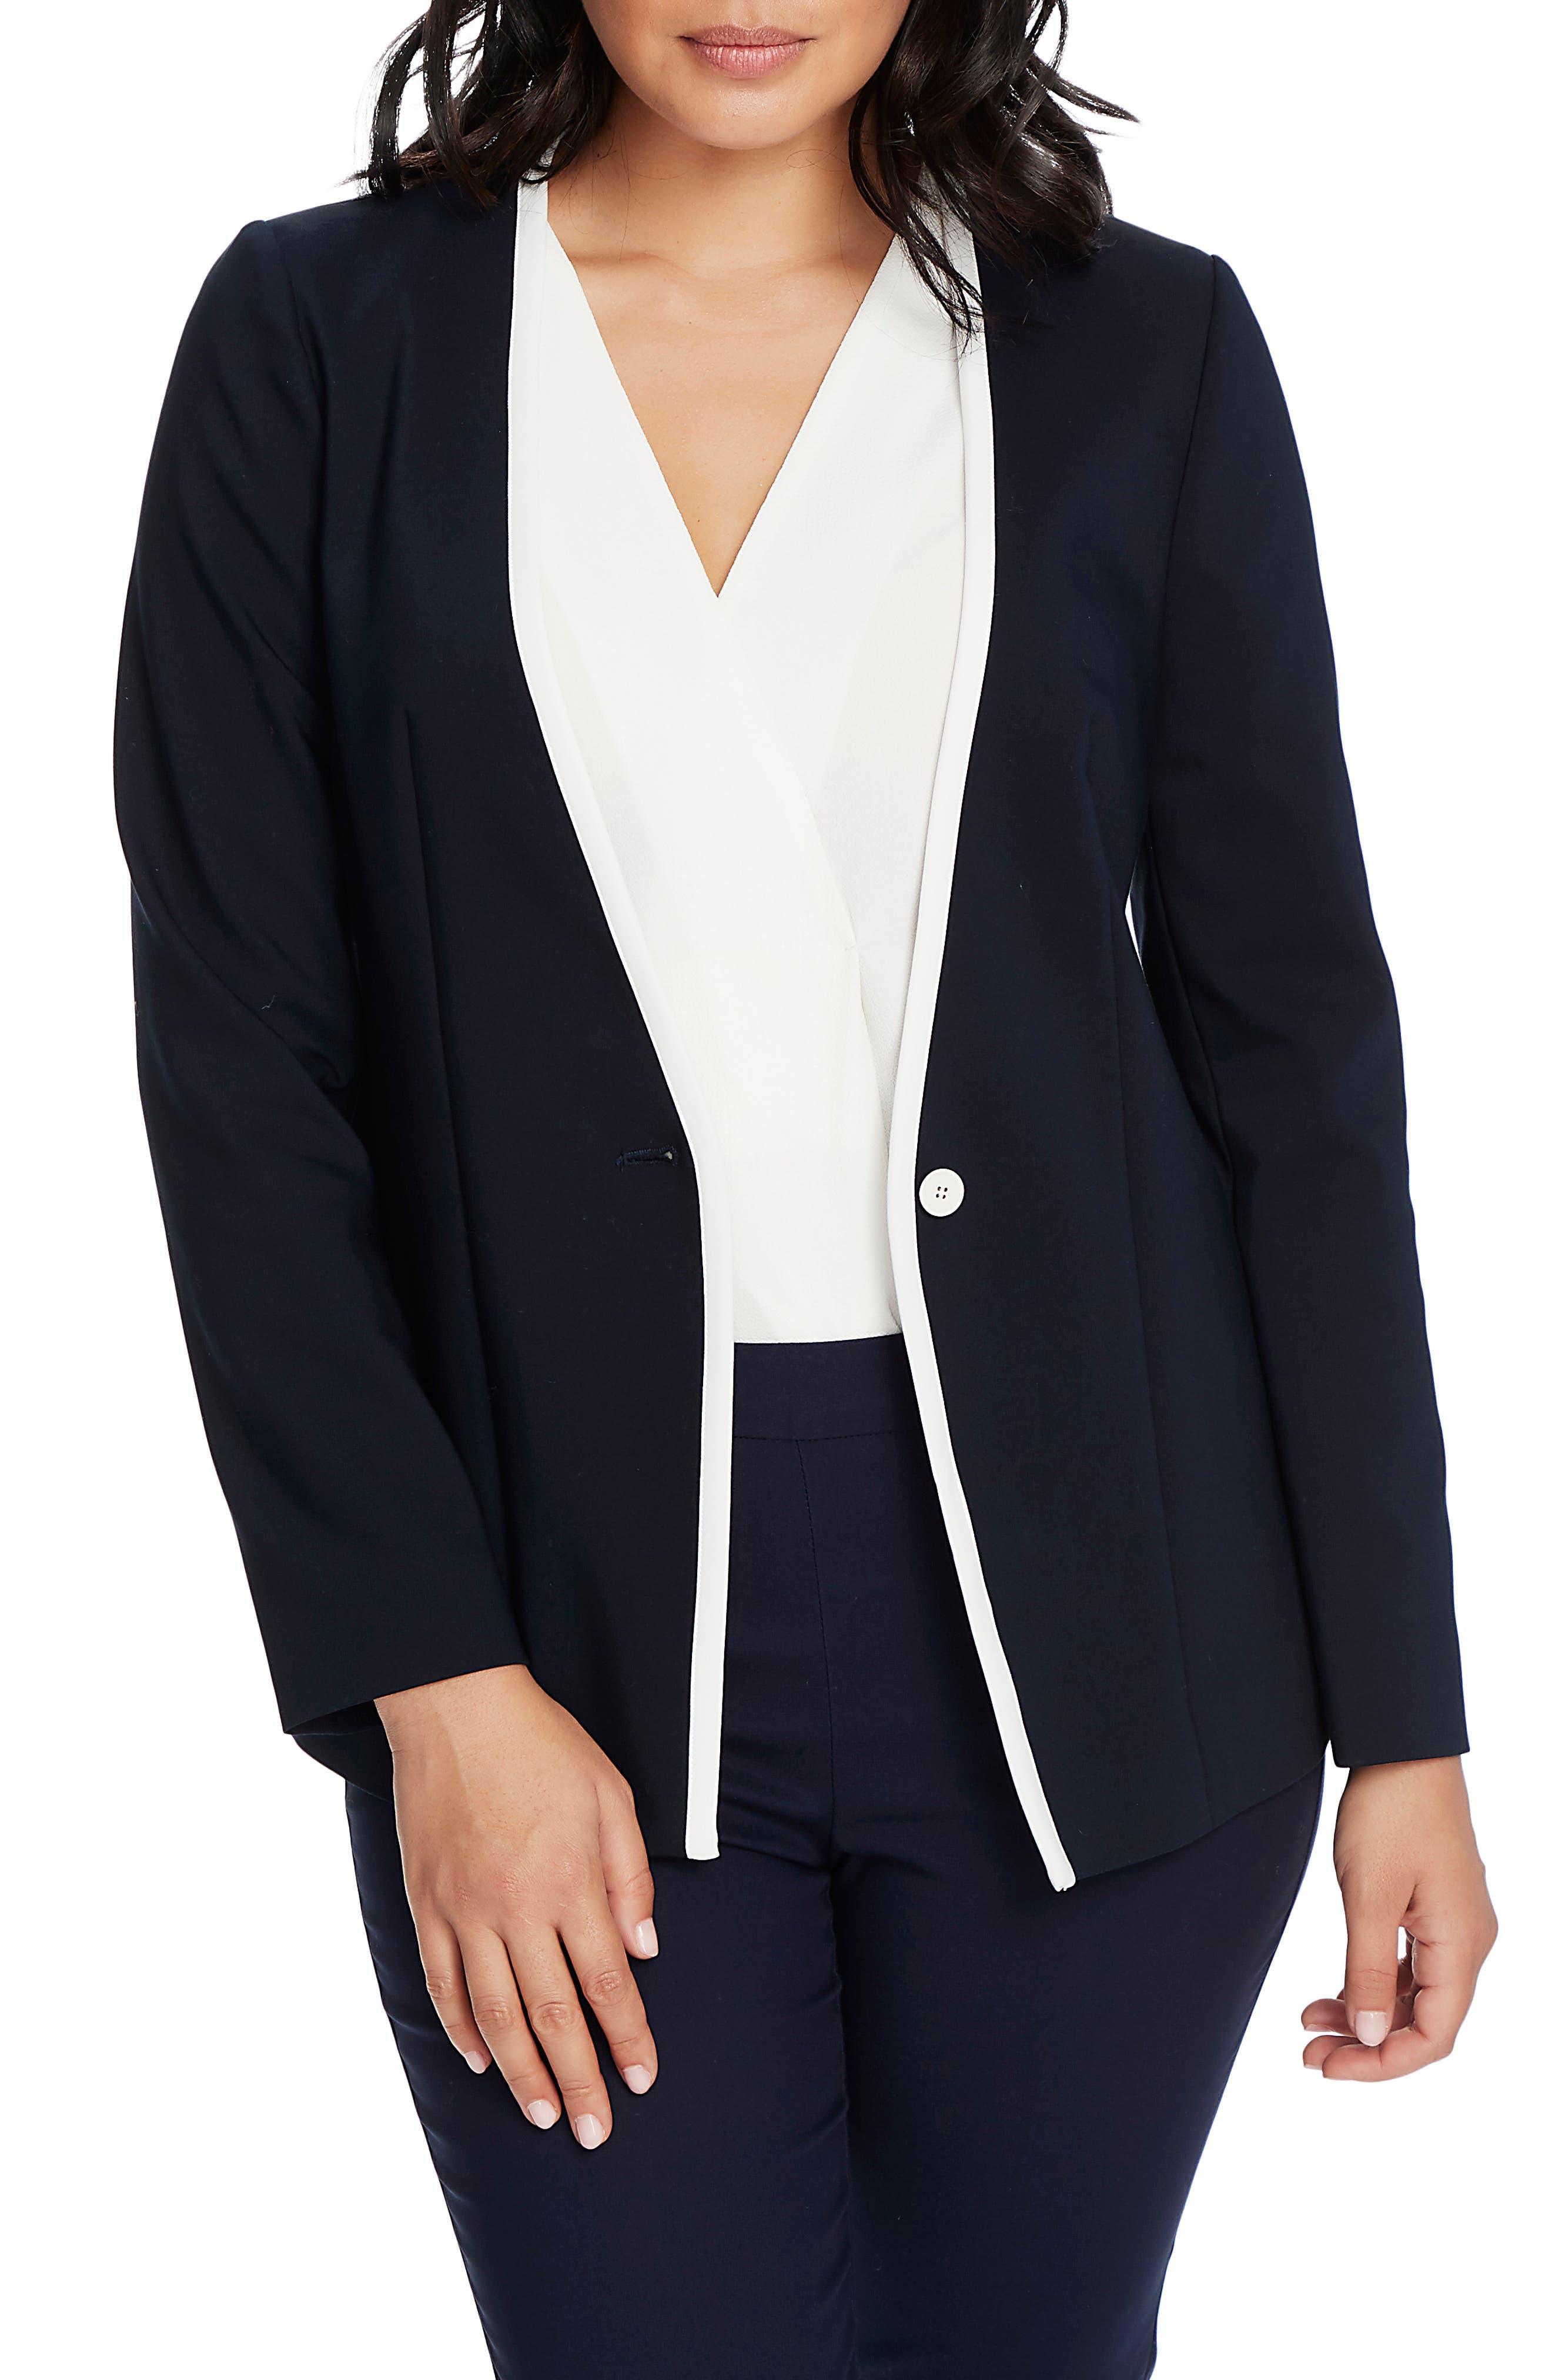 One-Button Contrast Trim Jacket